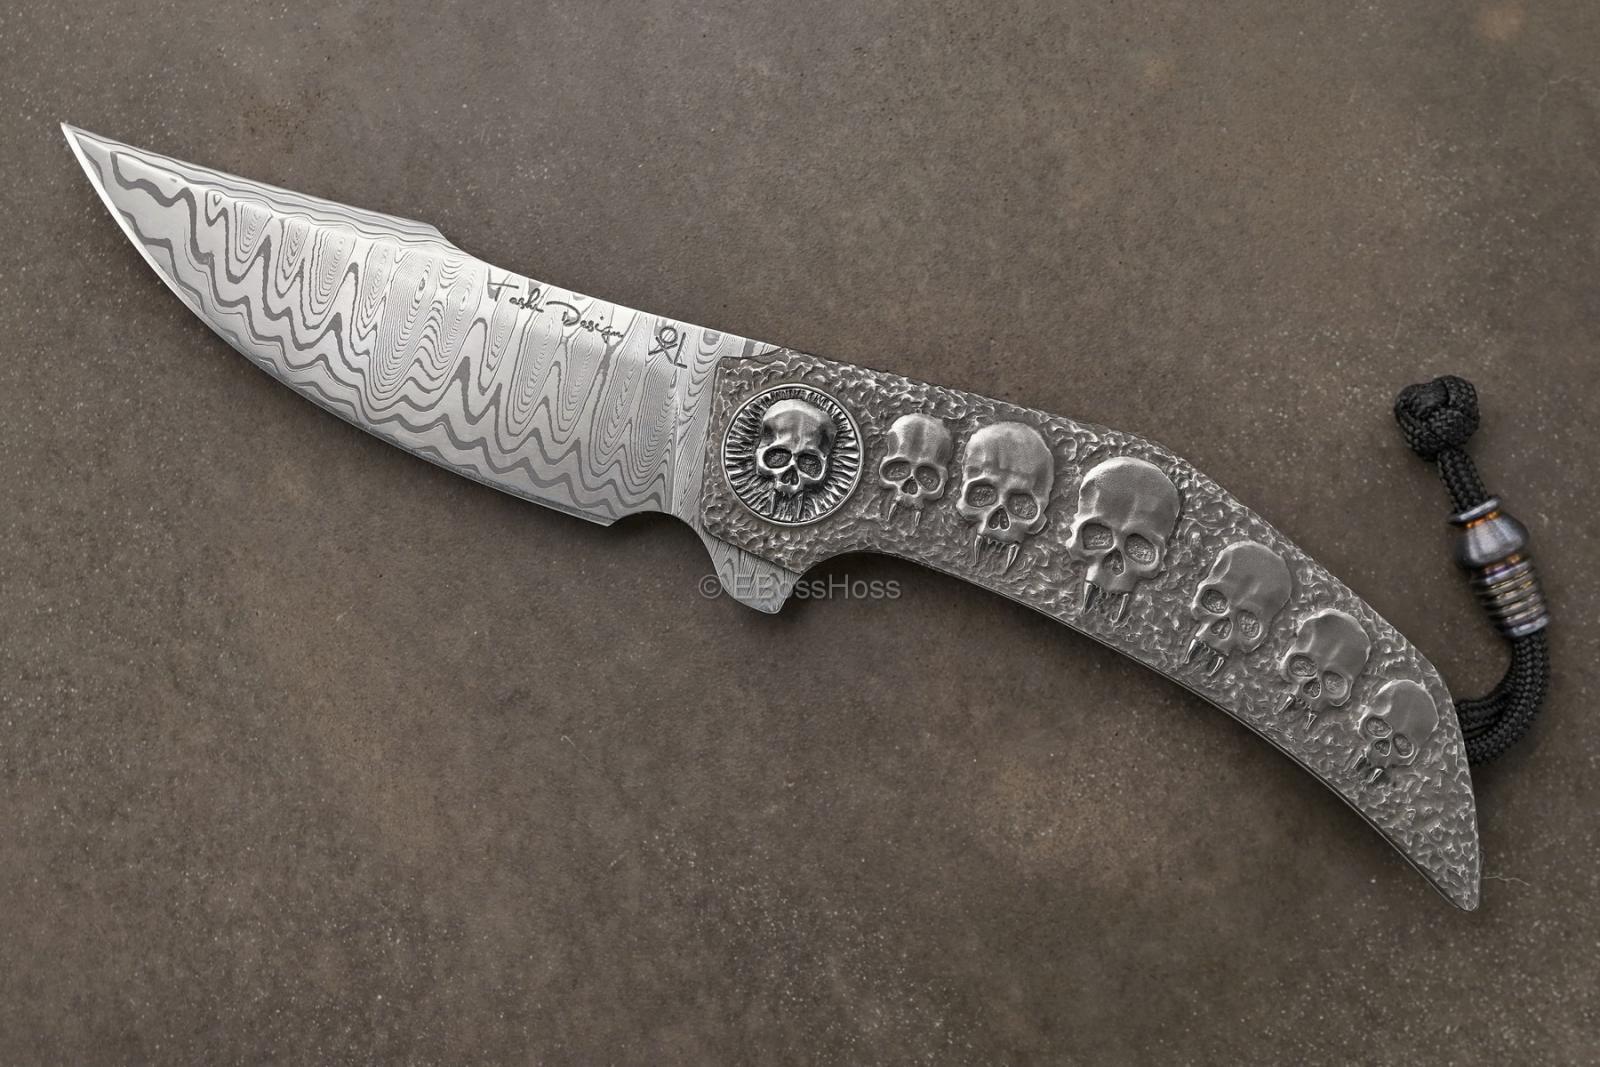 Gudy van Poppel Custom Deluxe Engraved Xerxes Flipper Collaboration